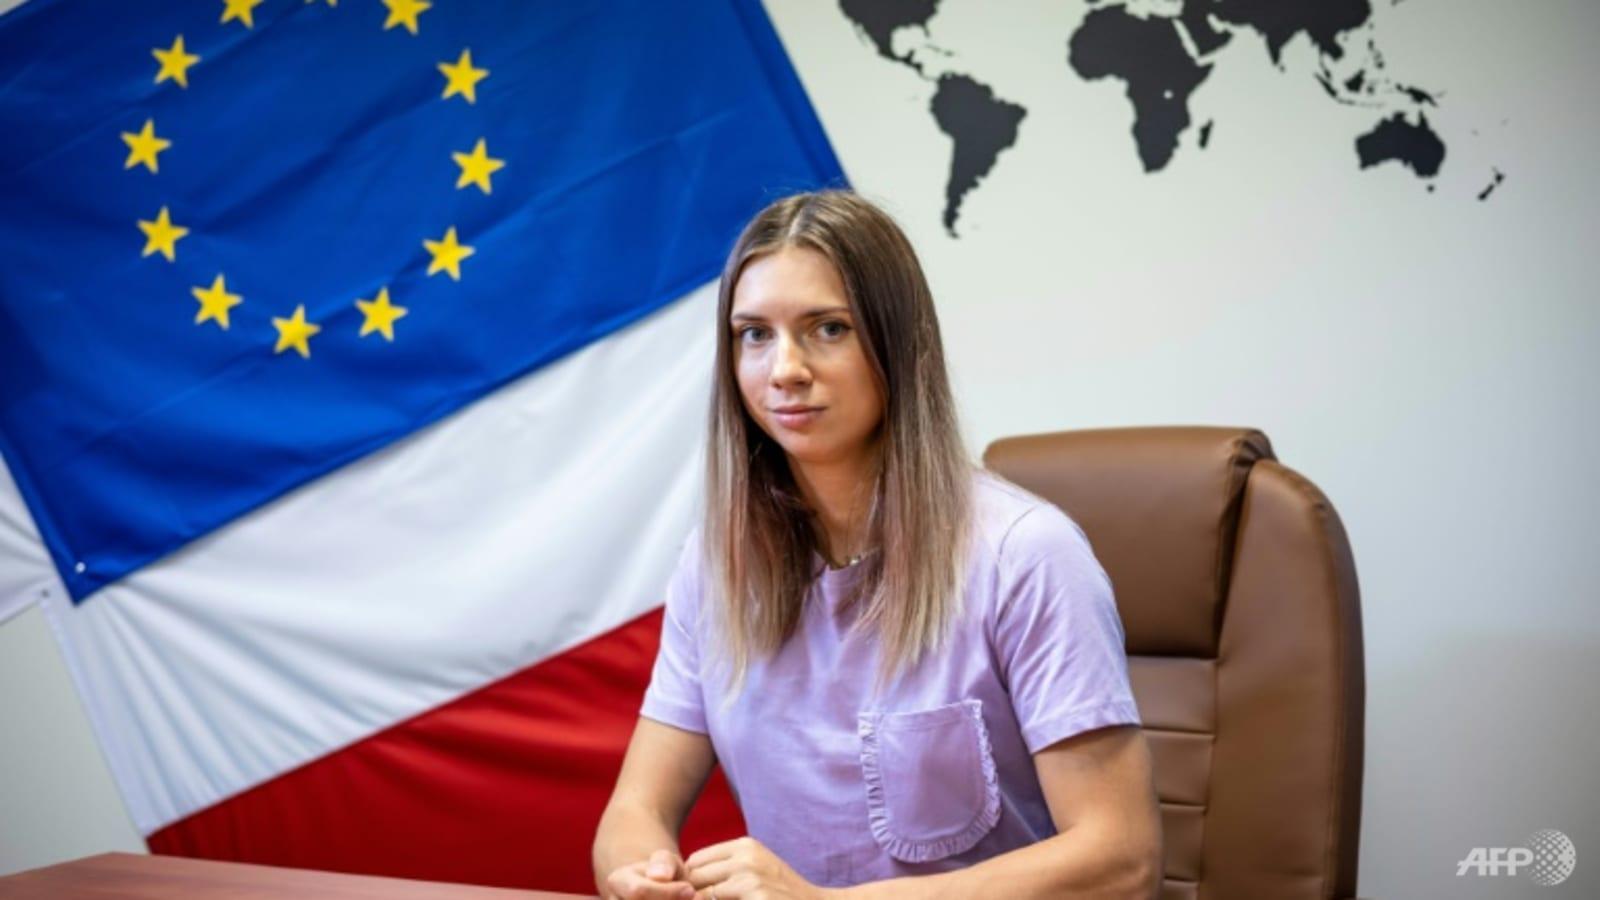 'Stop being afraid', dissident athlete tells Belarusians